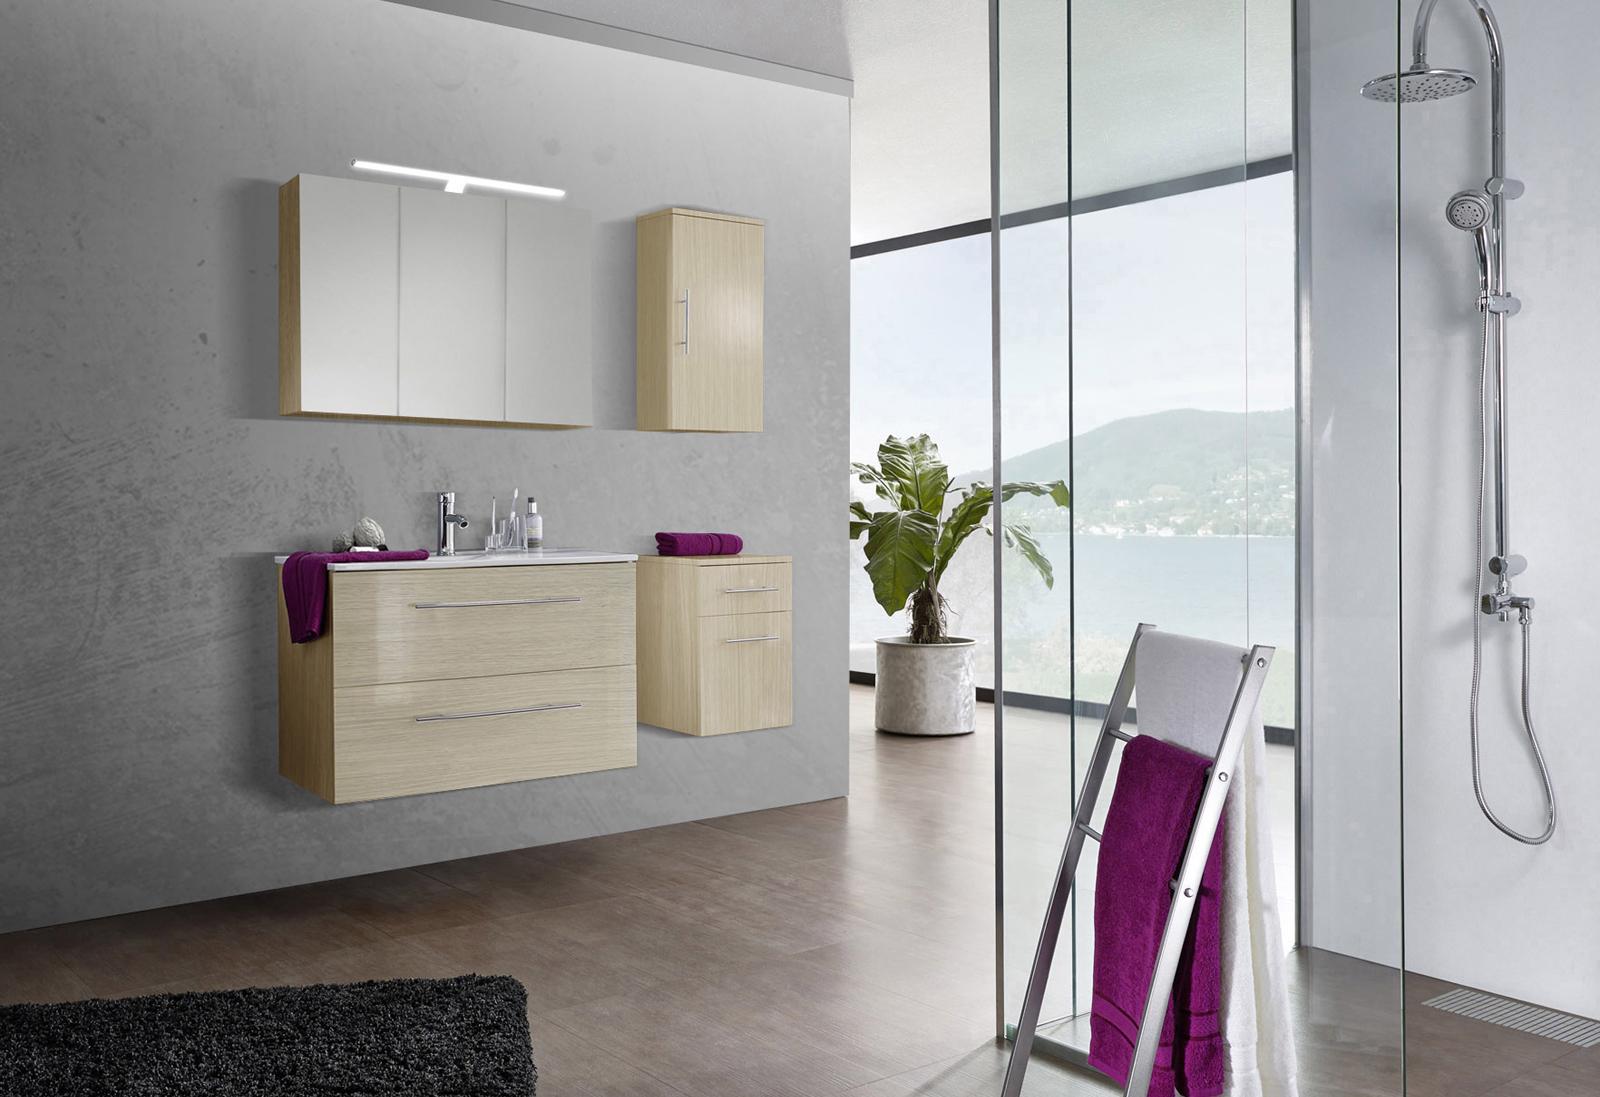 sam 4tlg badezimmer set sonomaeiche 90 cm verena demn chst. Black Bedroom Furniture Sets. Home Design Ideas